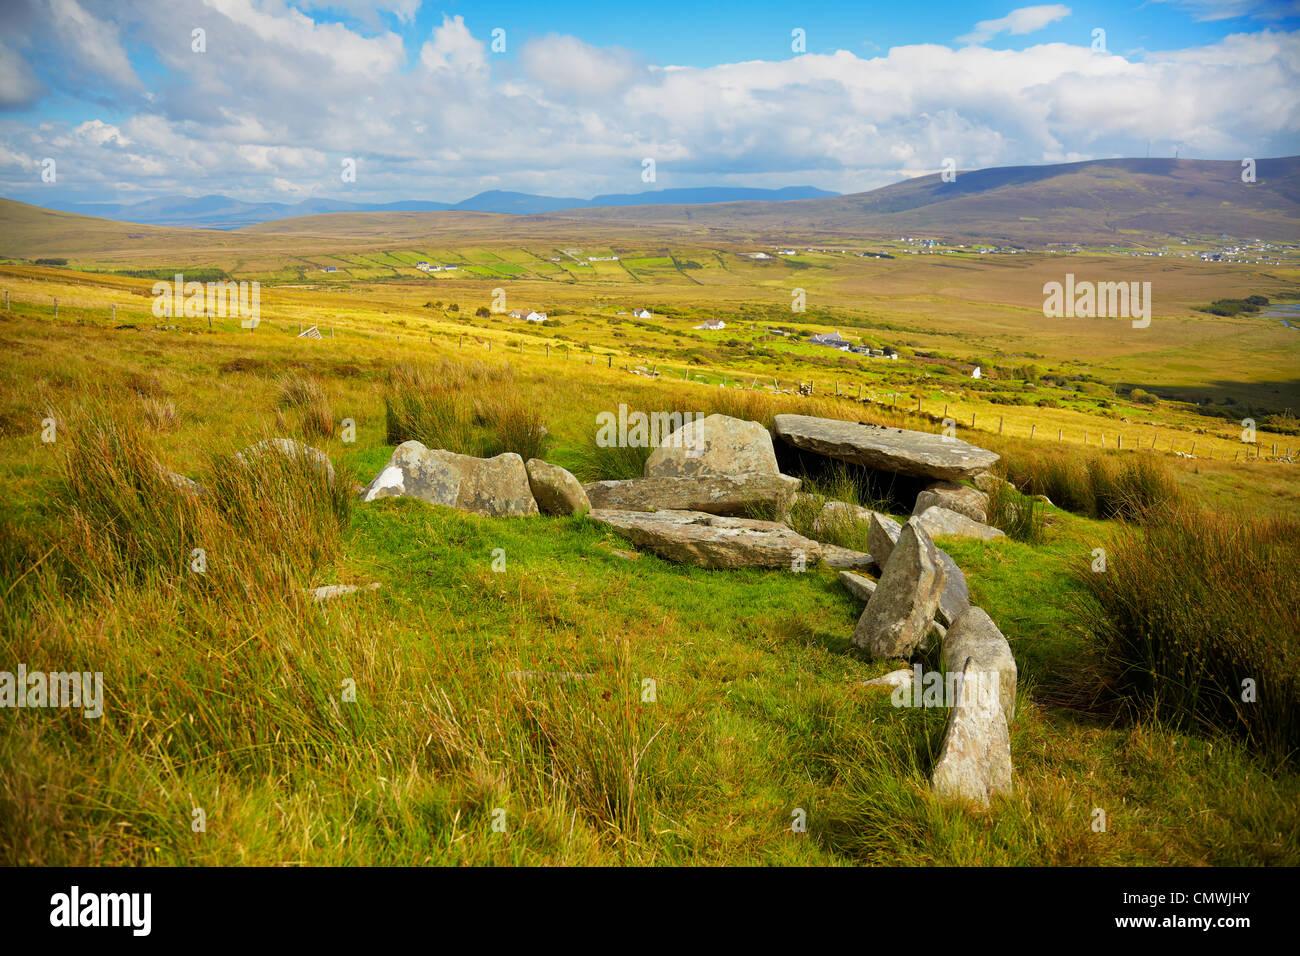 Slievemore dolmen in summer season on Achill Island, Ireland. Stock Photo